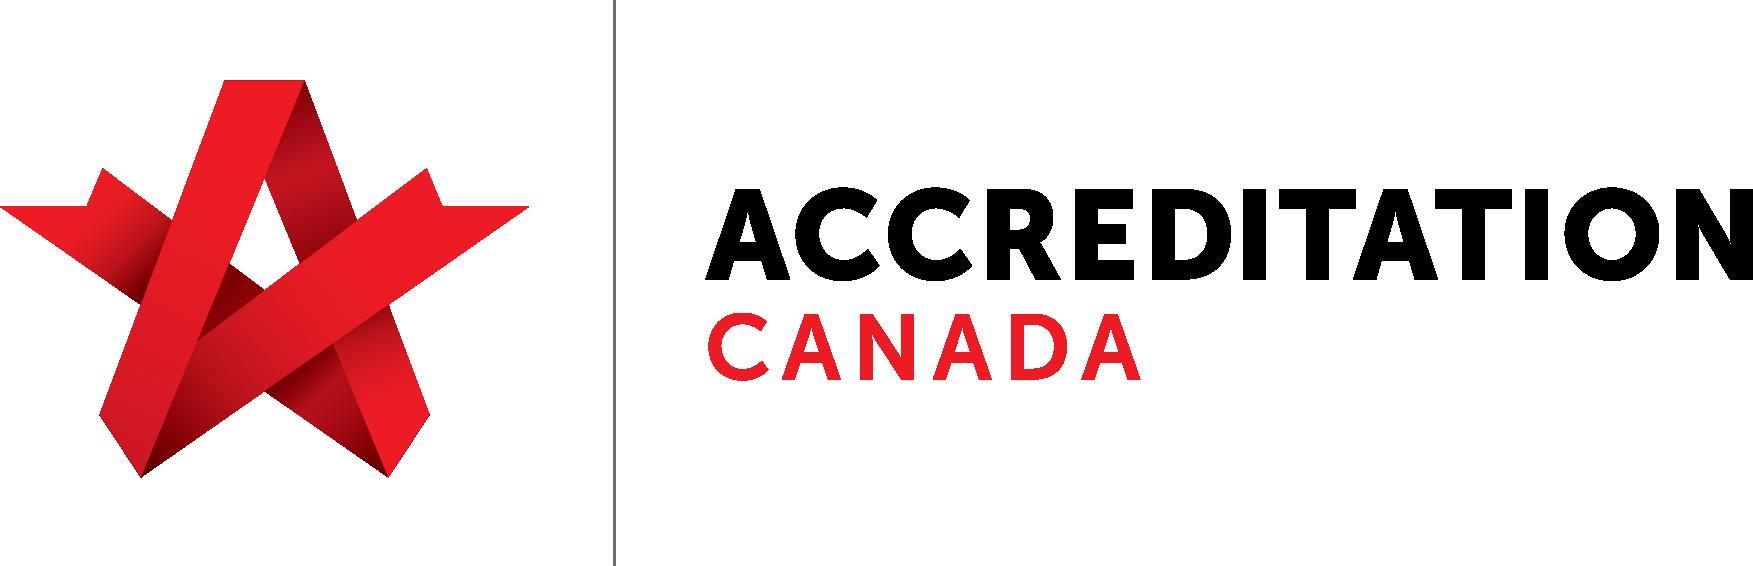 Accreditation Canada / HSO